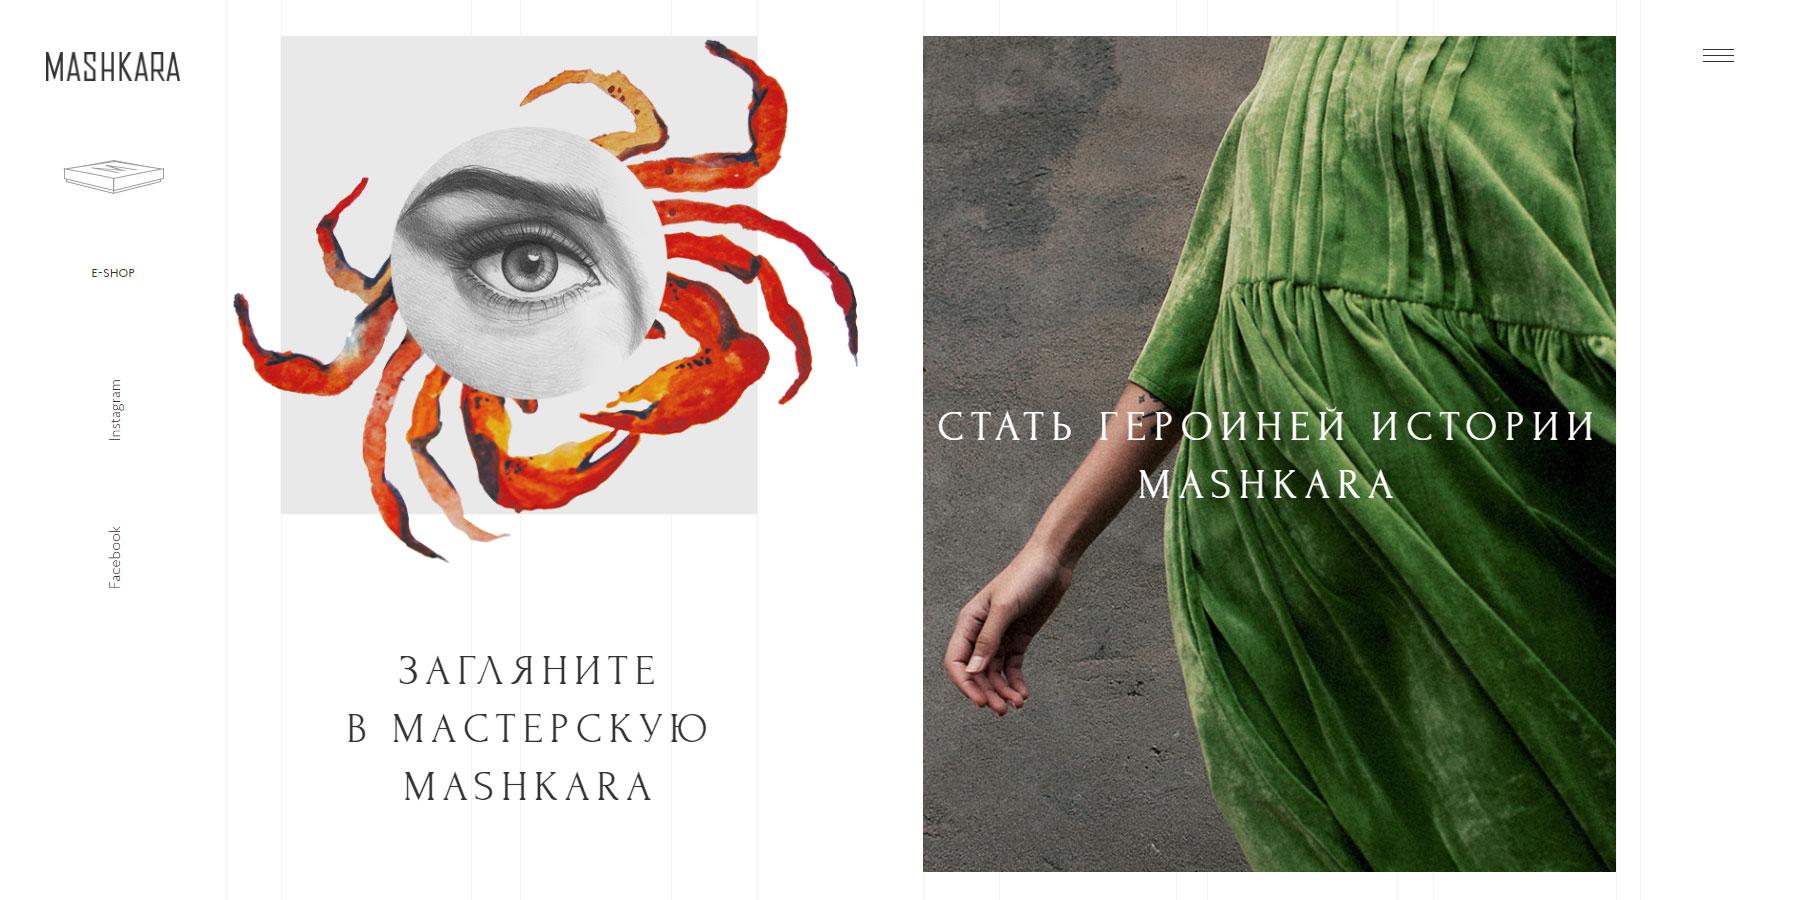 Mashkara - Website of the Day